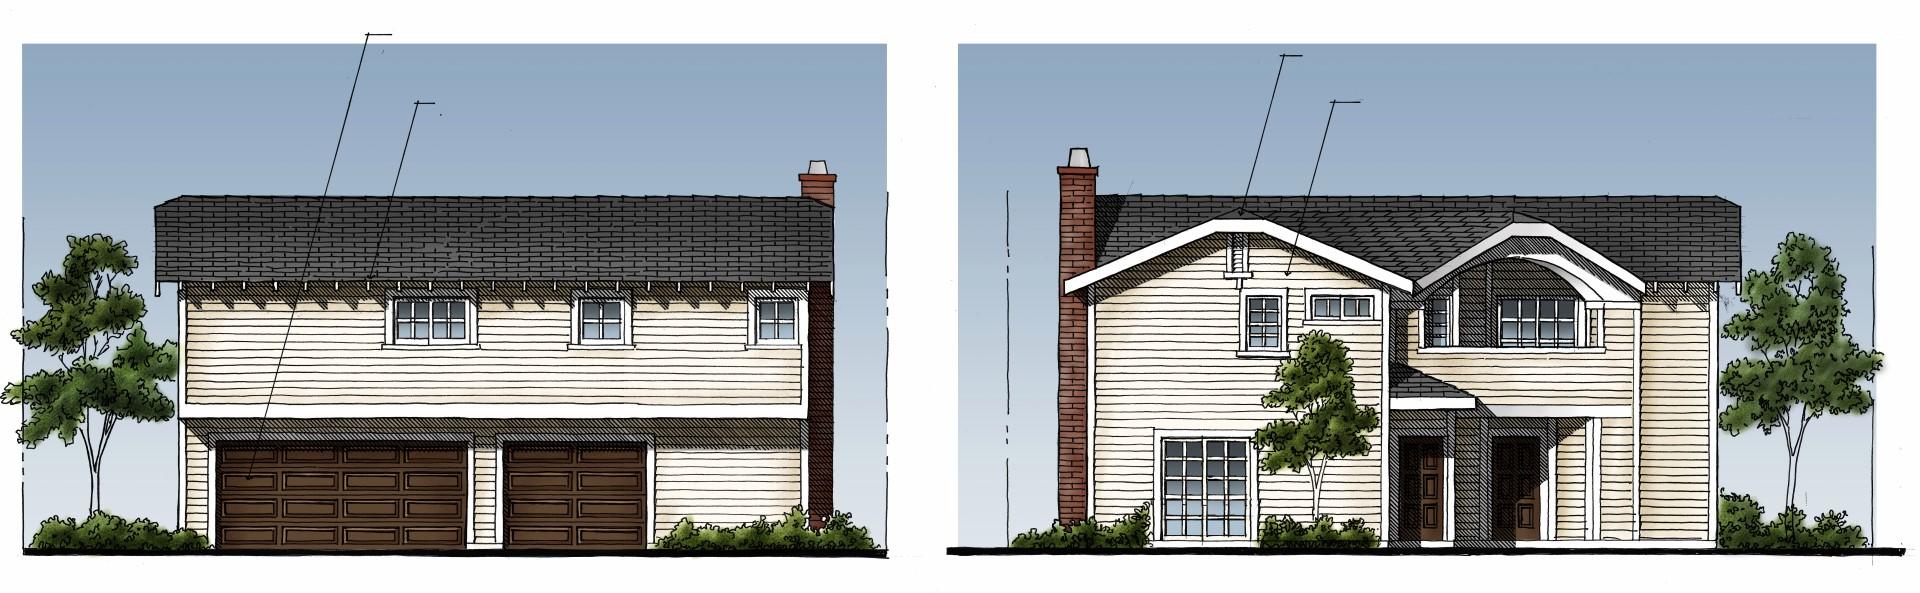 3 REDMAN ALLEY HOUSE